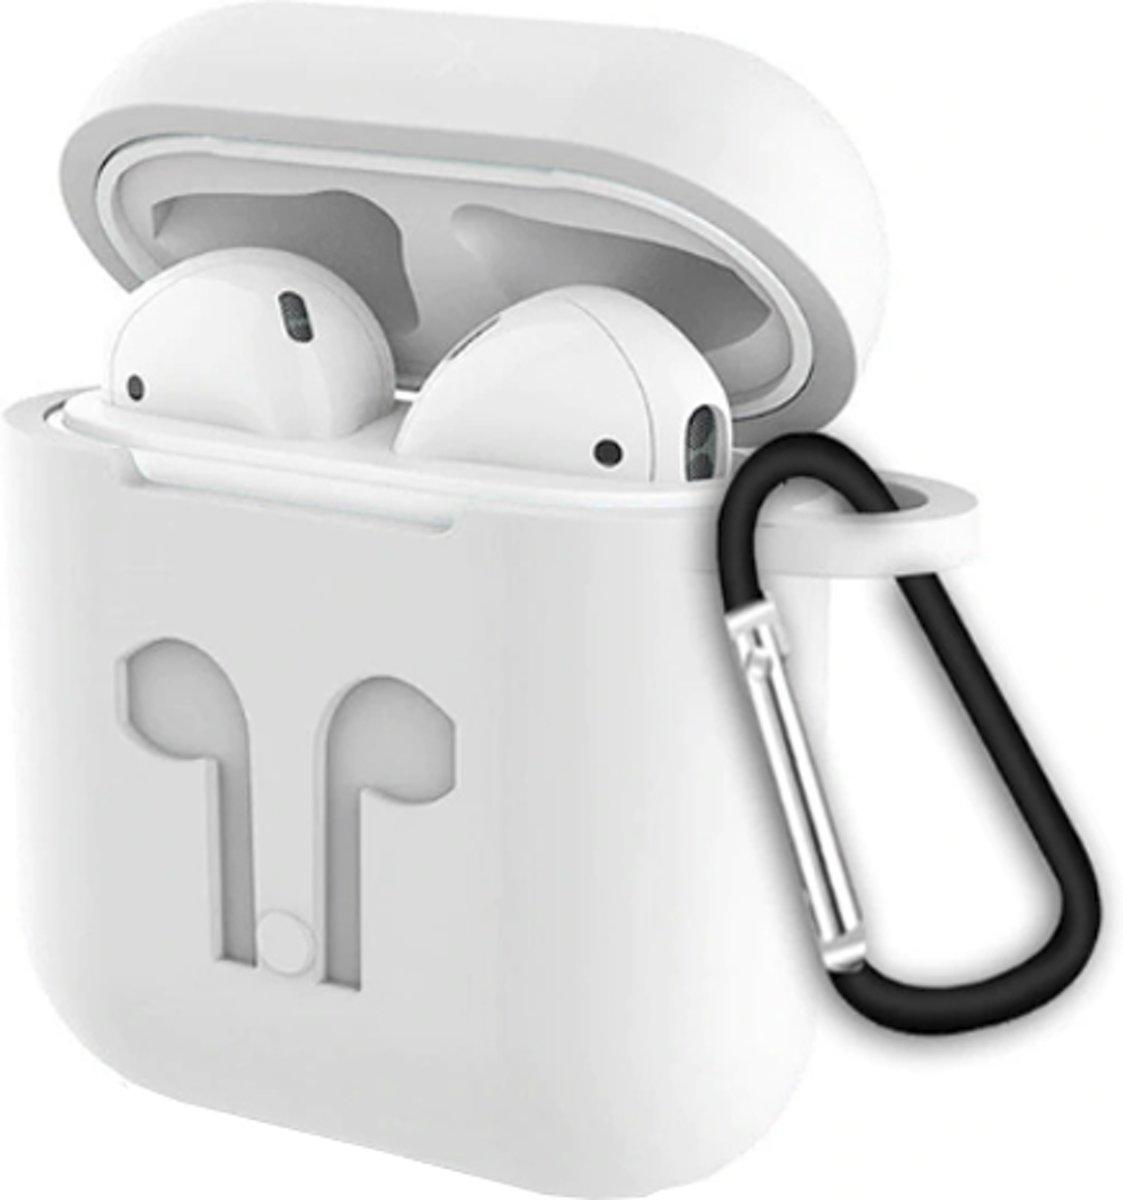 Airpods Hoesje Wit - Siliconen Case Cover voor Apple Airpods - 3 in 1 set! kopen